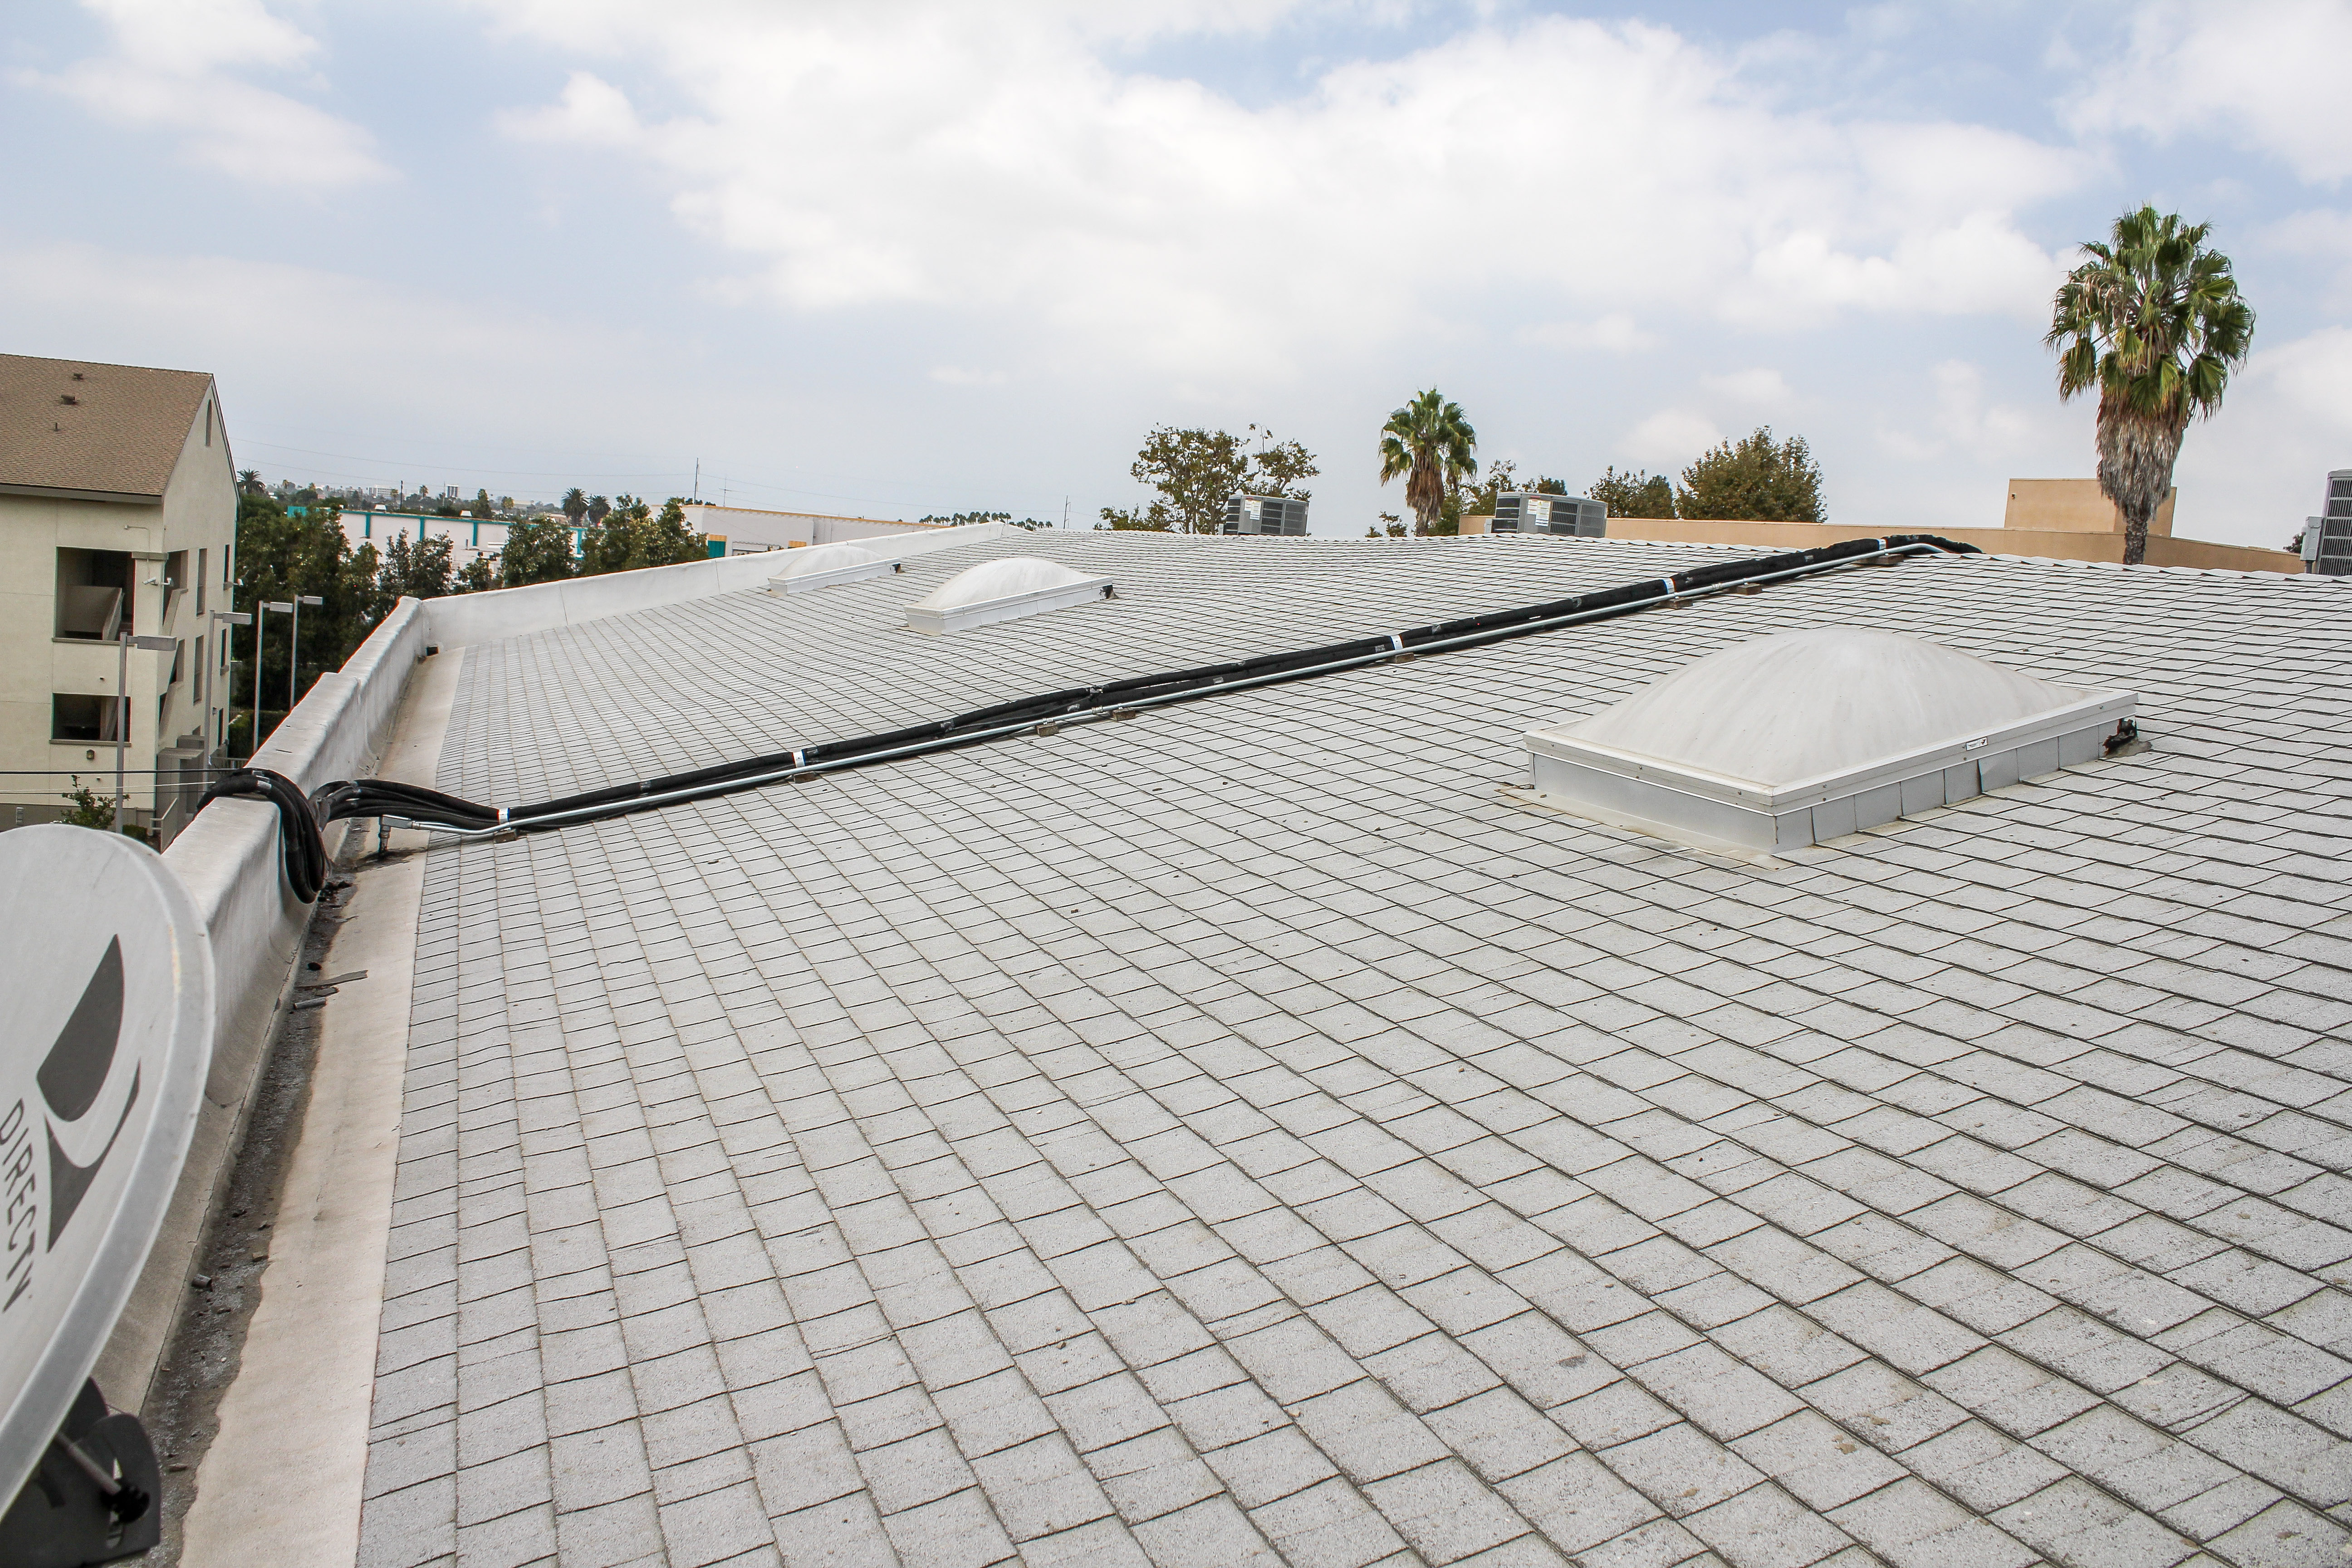 3rd Floor Roof Access